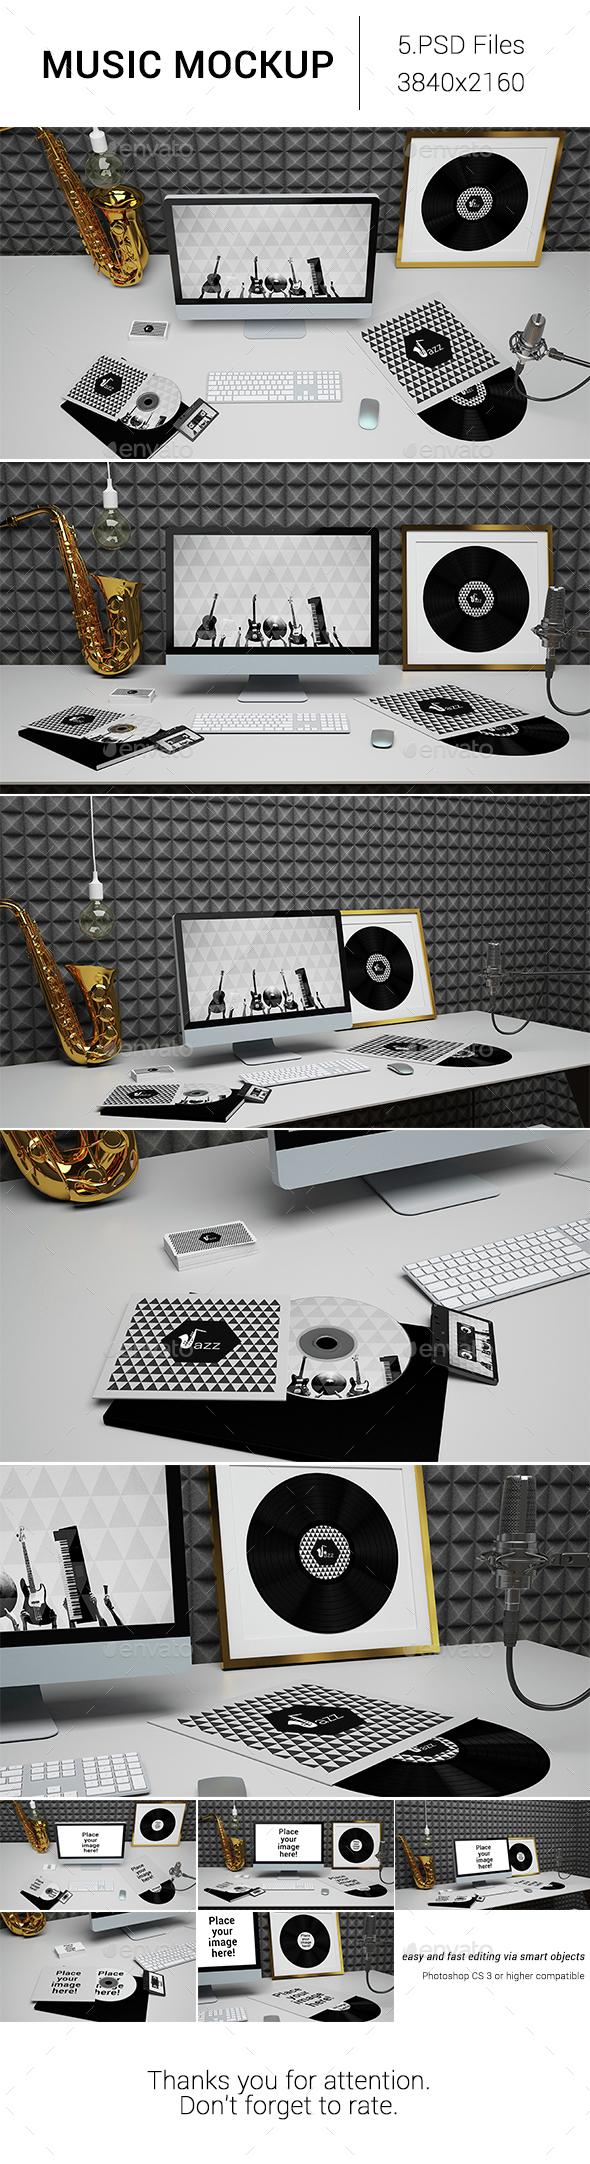 Music Mockup - Monitors Displays